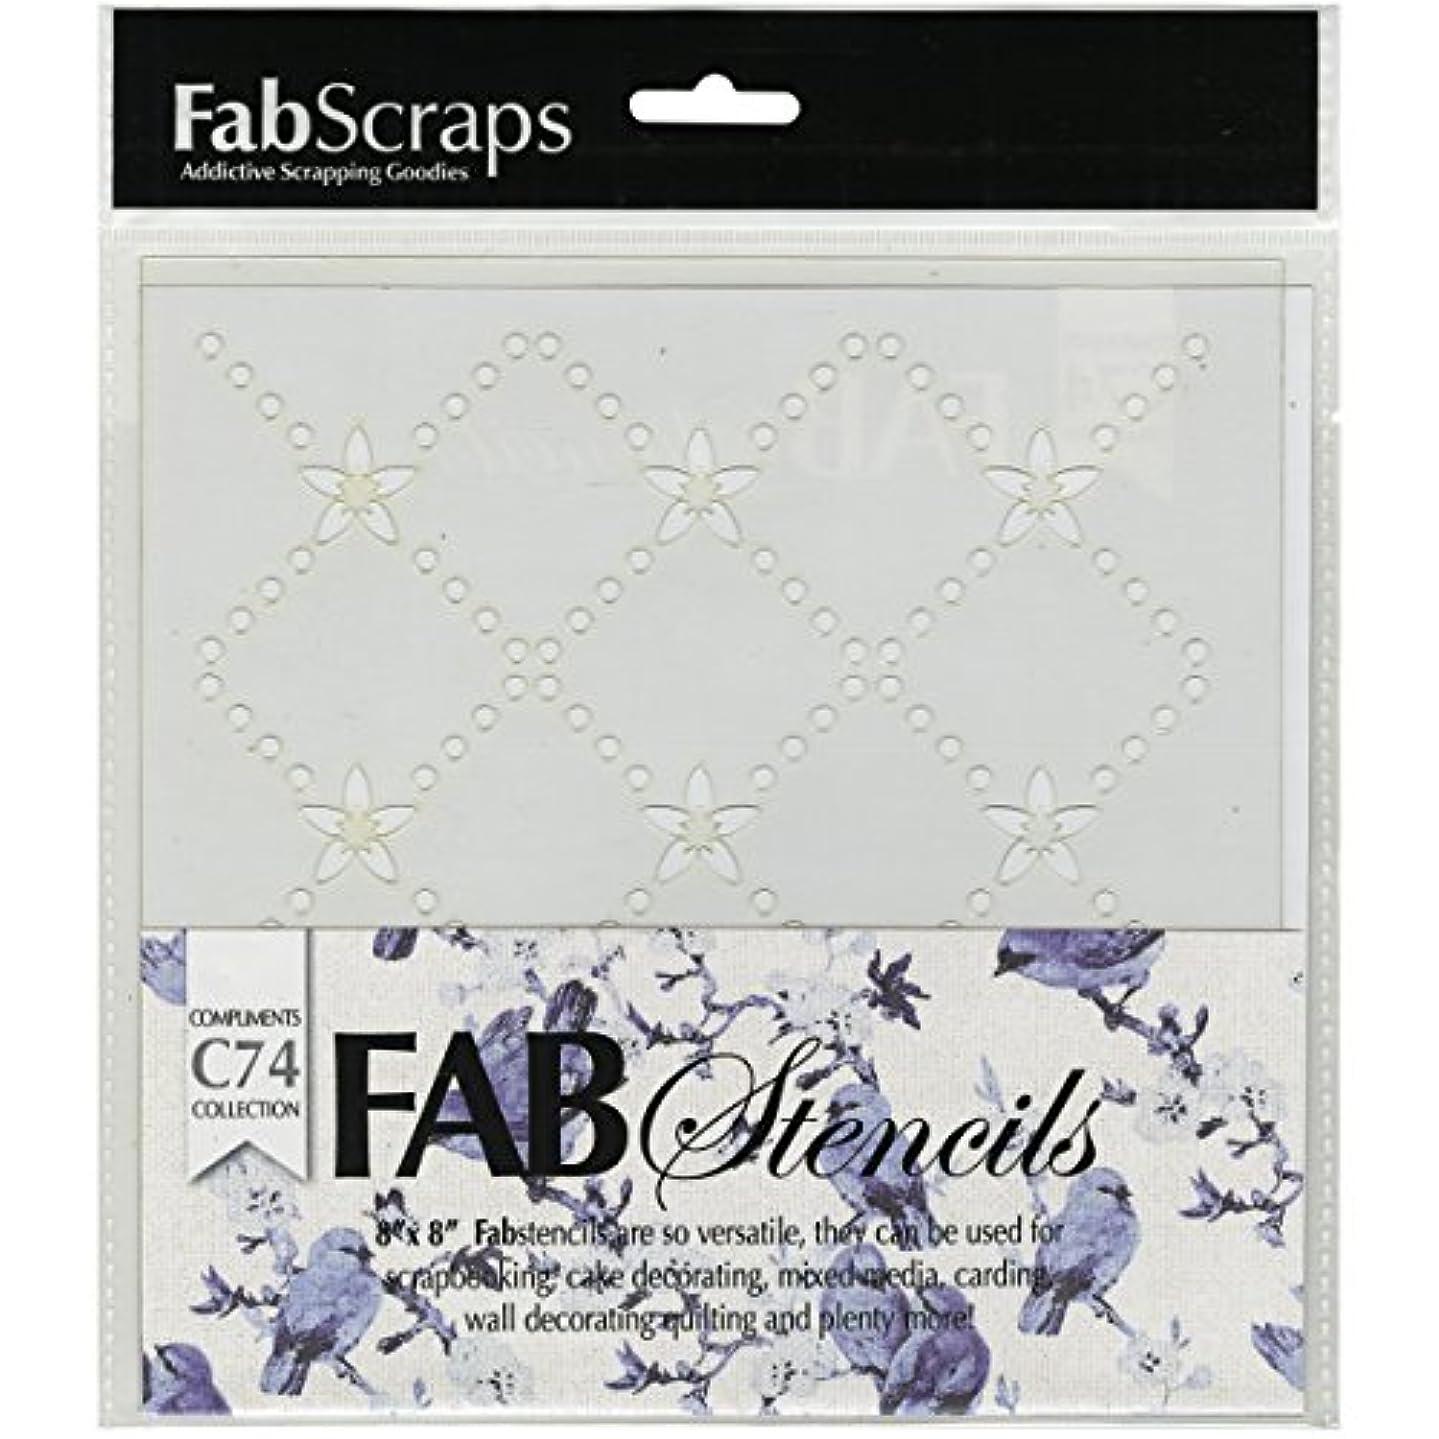 FabScraps Kaleidoscope Plastic Stencil, 8 x 8